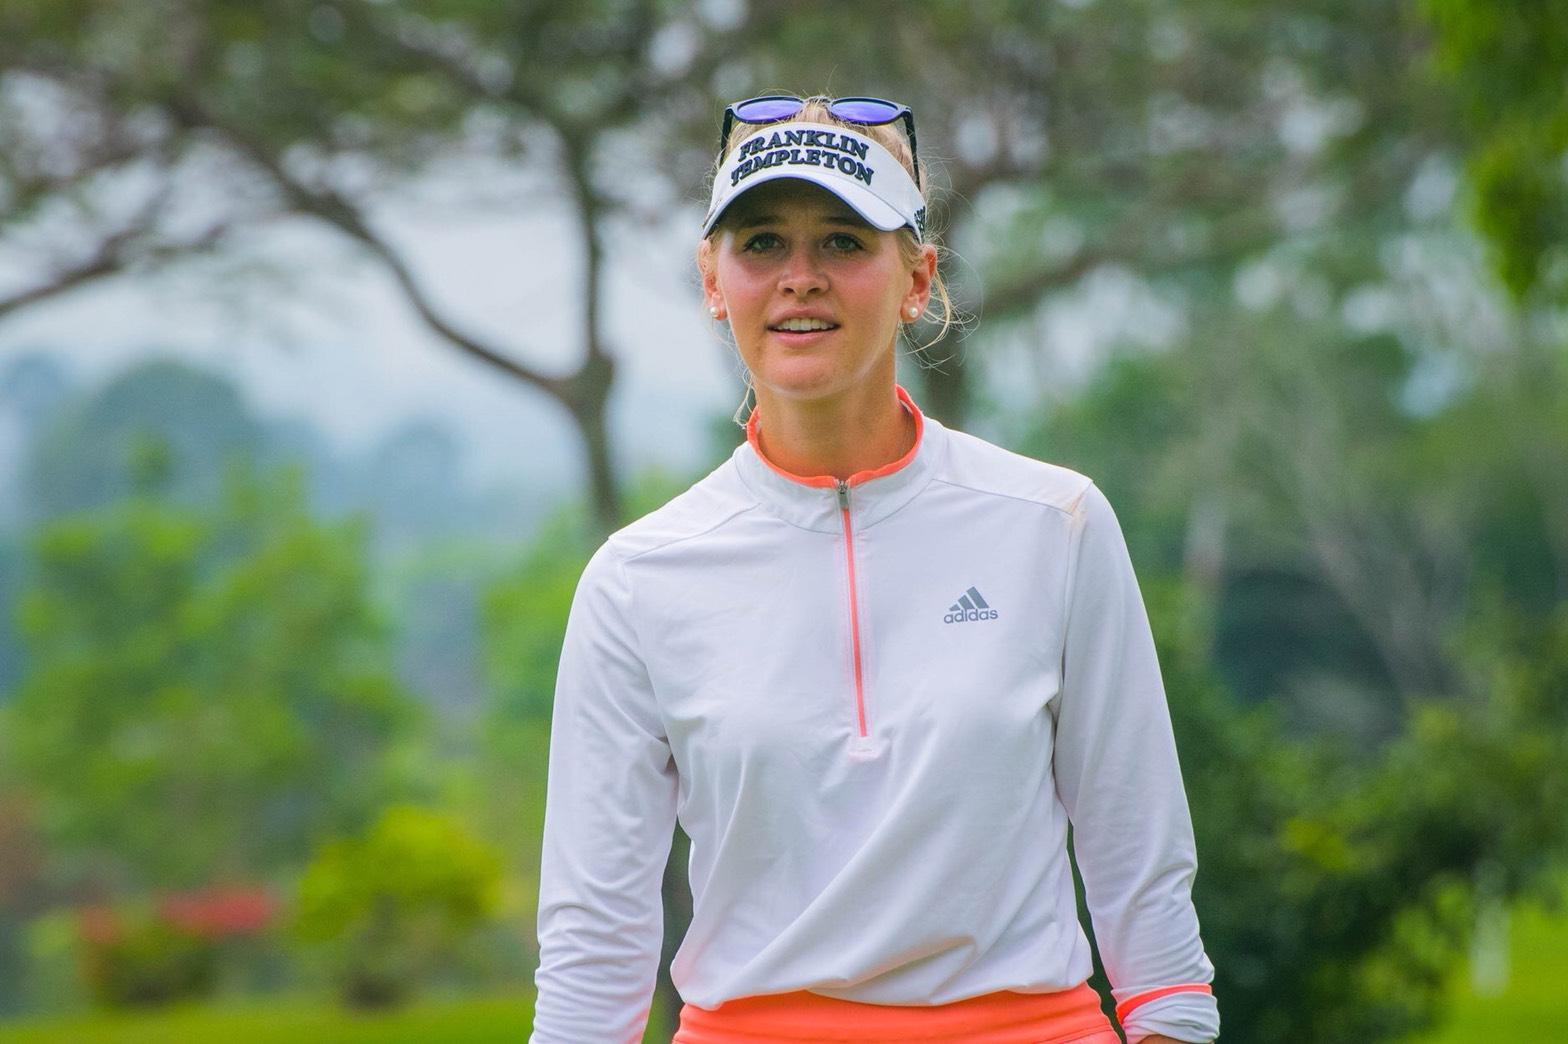 Honda LPGA 2018 Winner : Jessica Korda